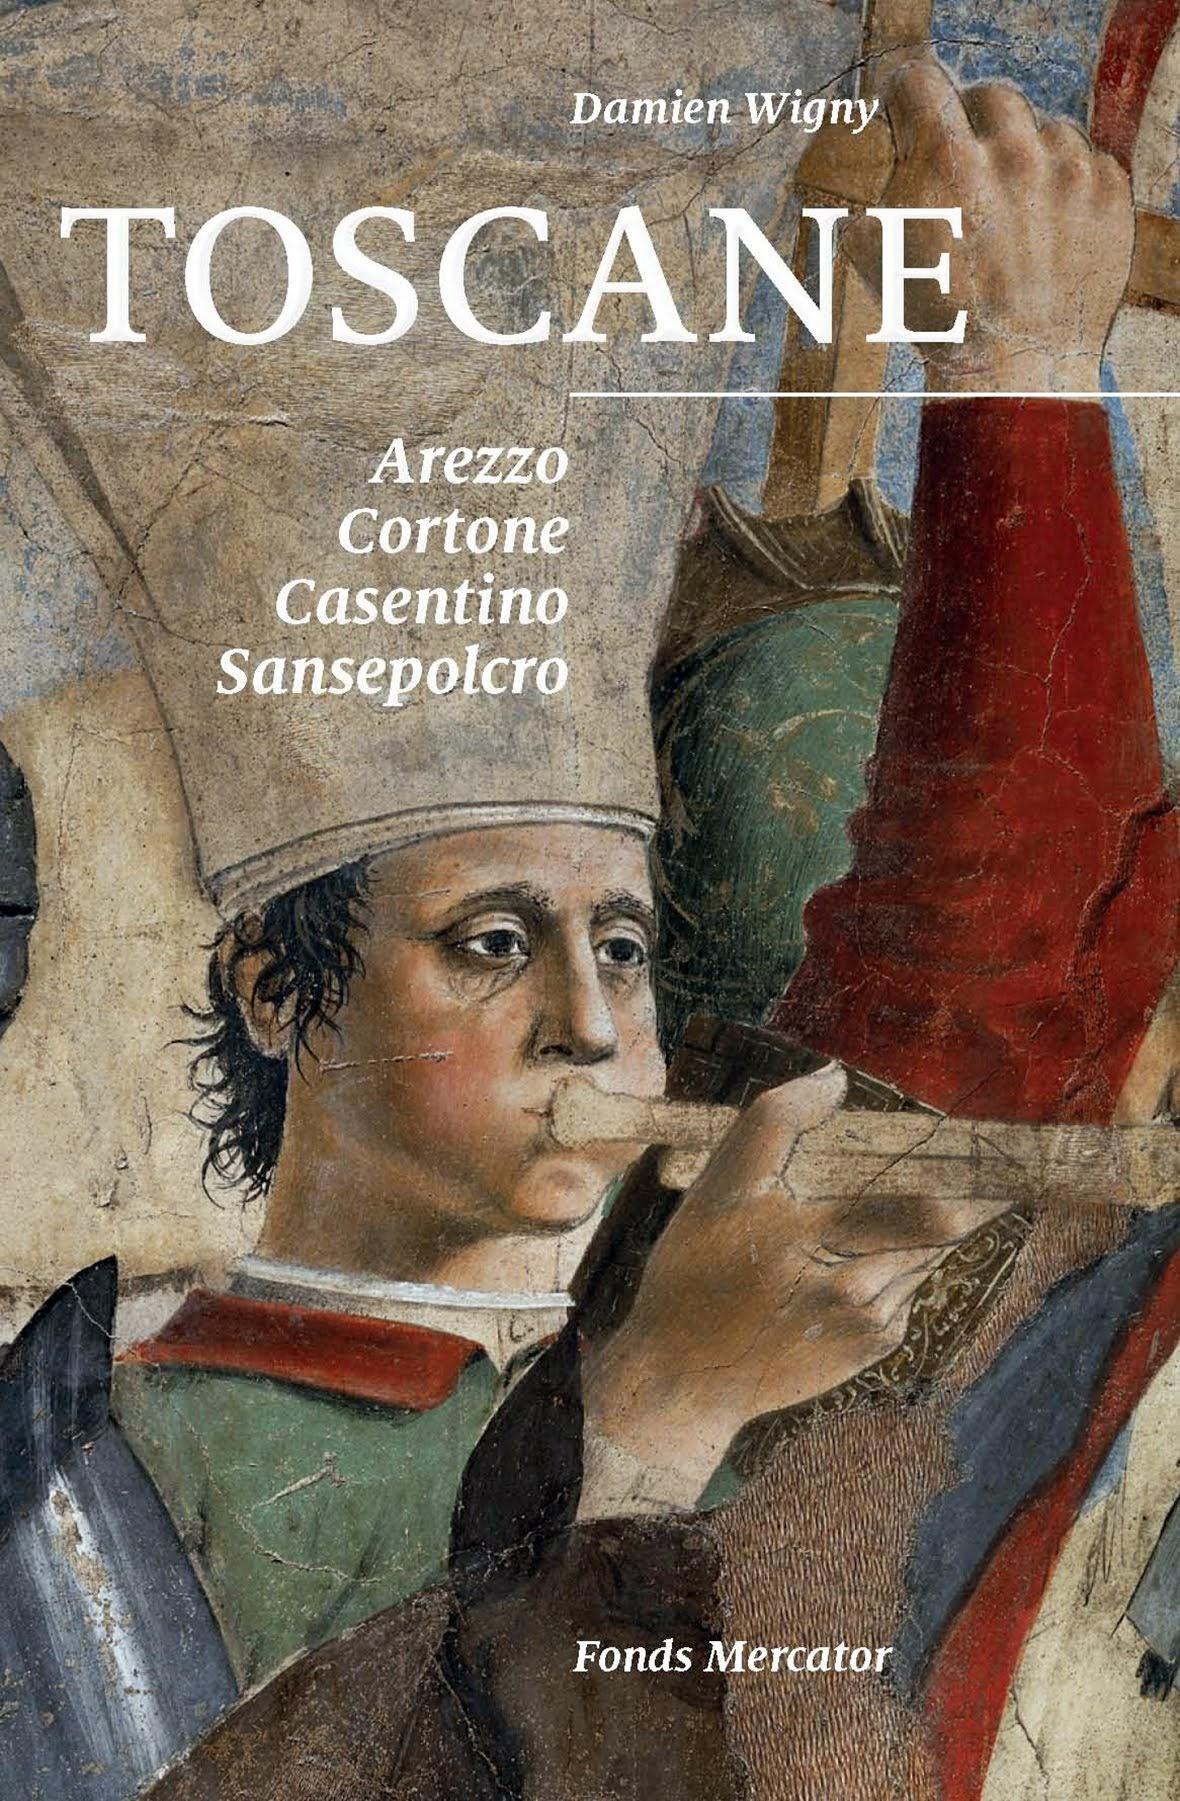 Damien Wigny, Toscane: Arezzo, Cortone, Casentino, Sansepolcro, Scala, Mercatorfonds, 2013